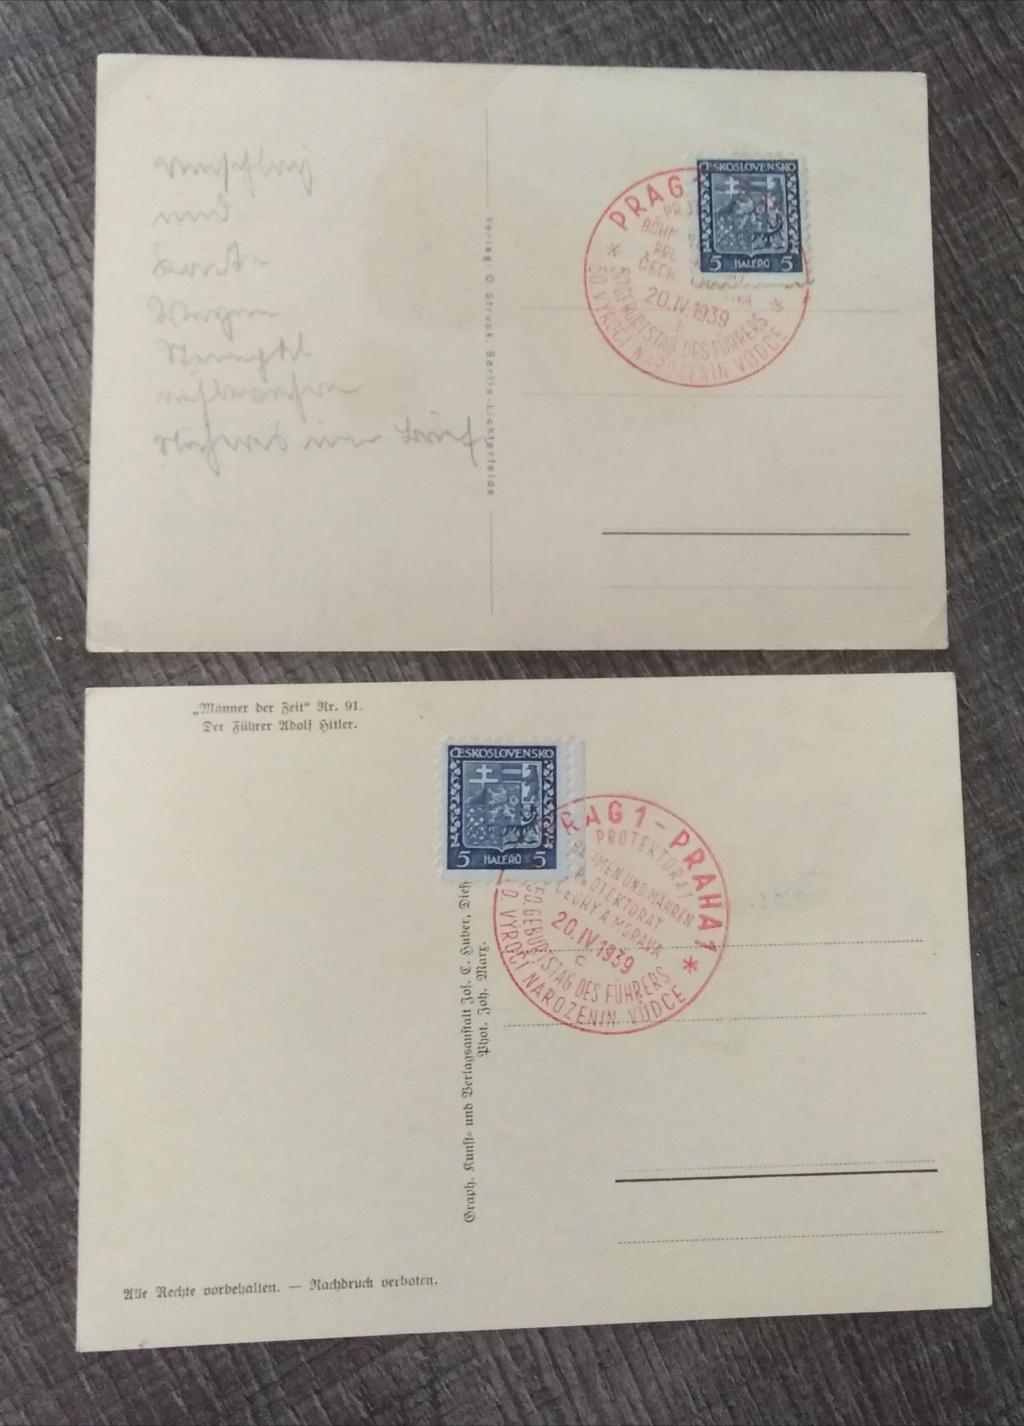 Cartes postales ww2 allemandes Img_1326